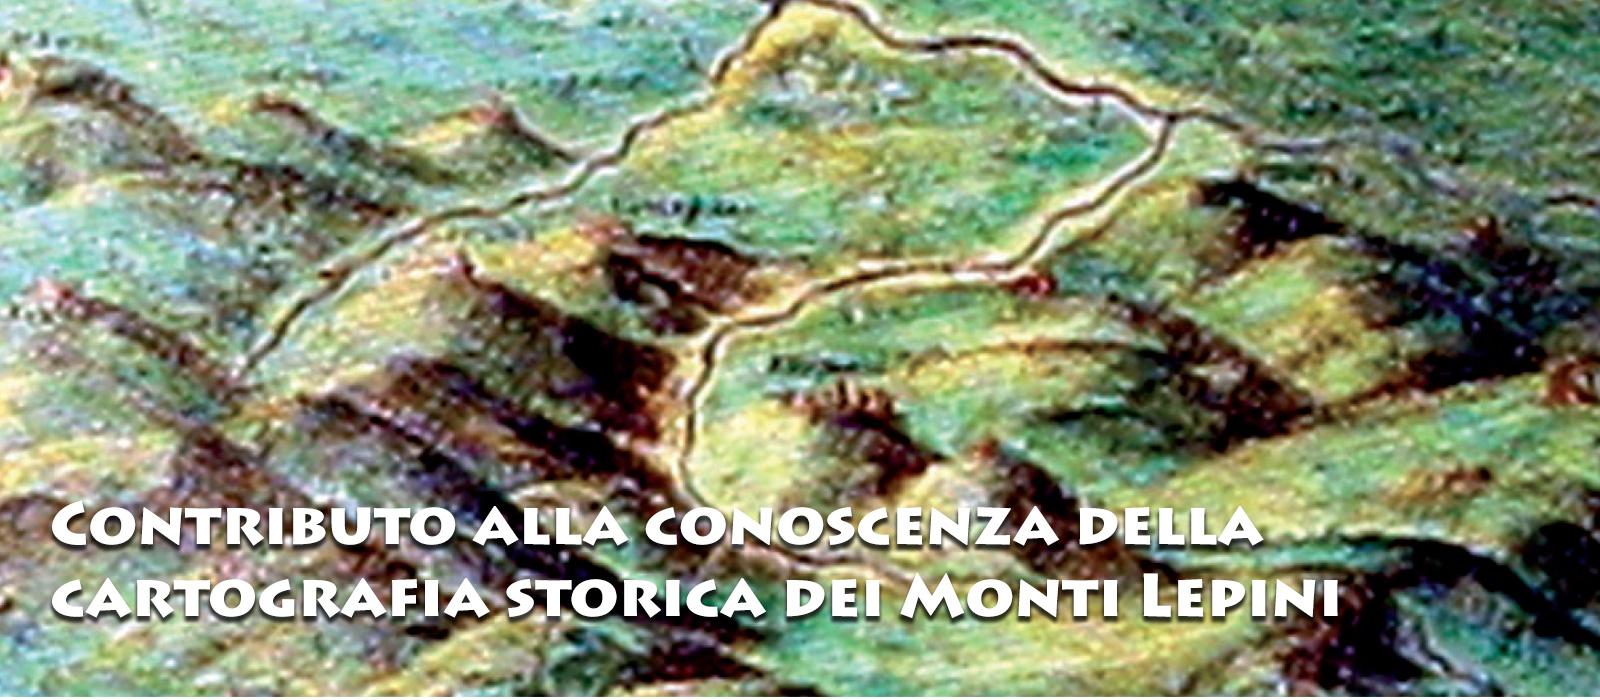 cartografia-monti-lepini